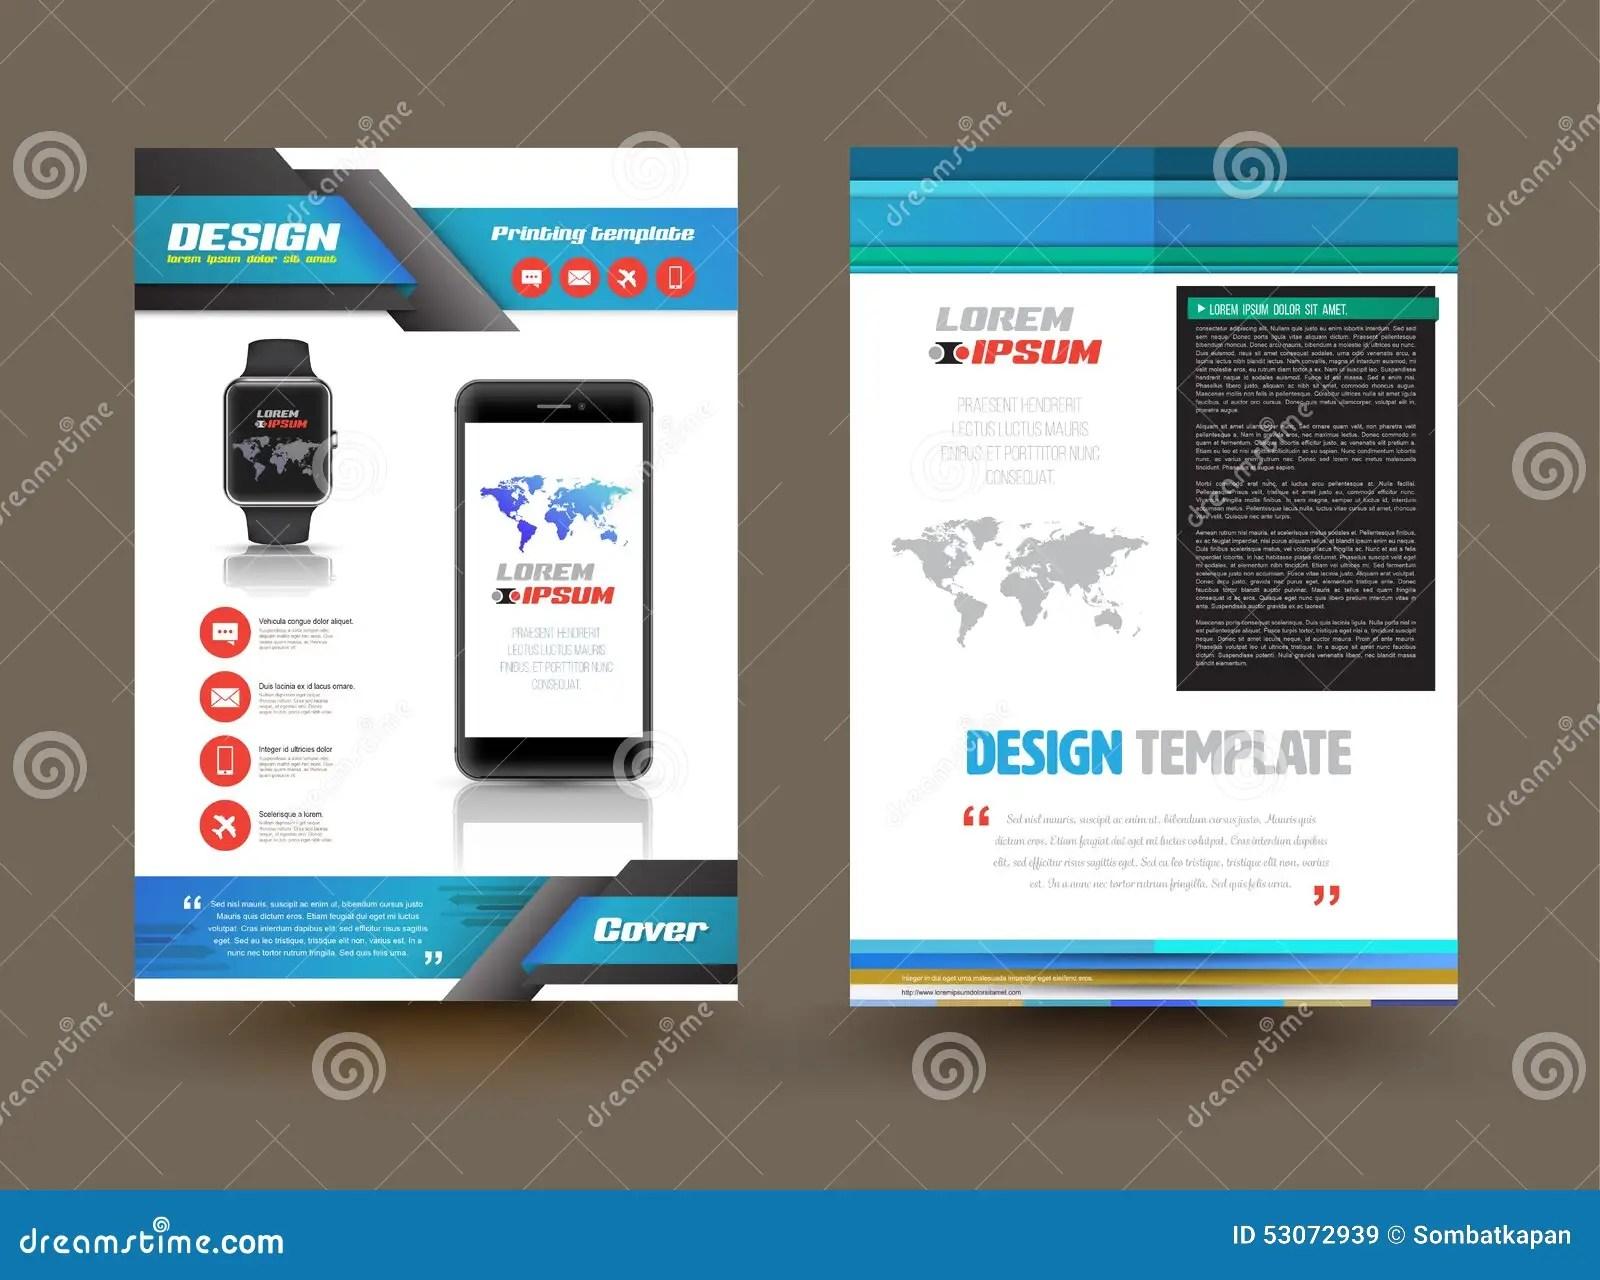 Sample Product Brochures Ideal Vistalist Co